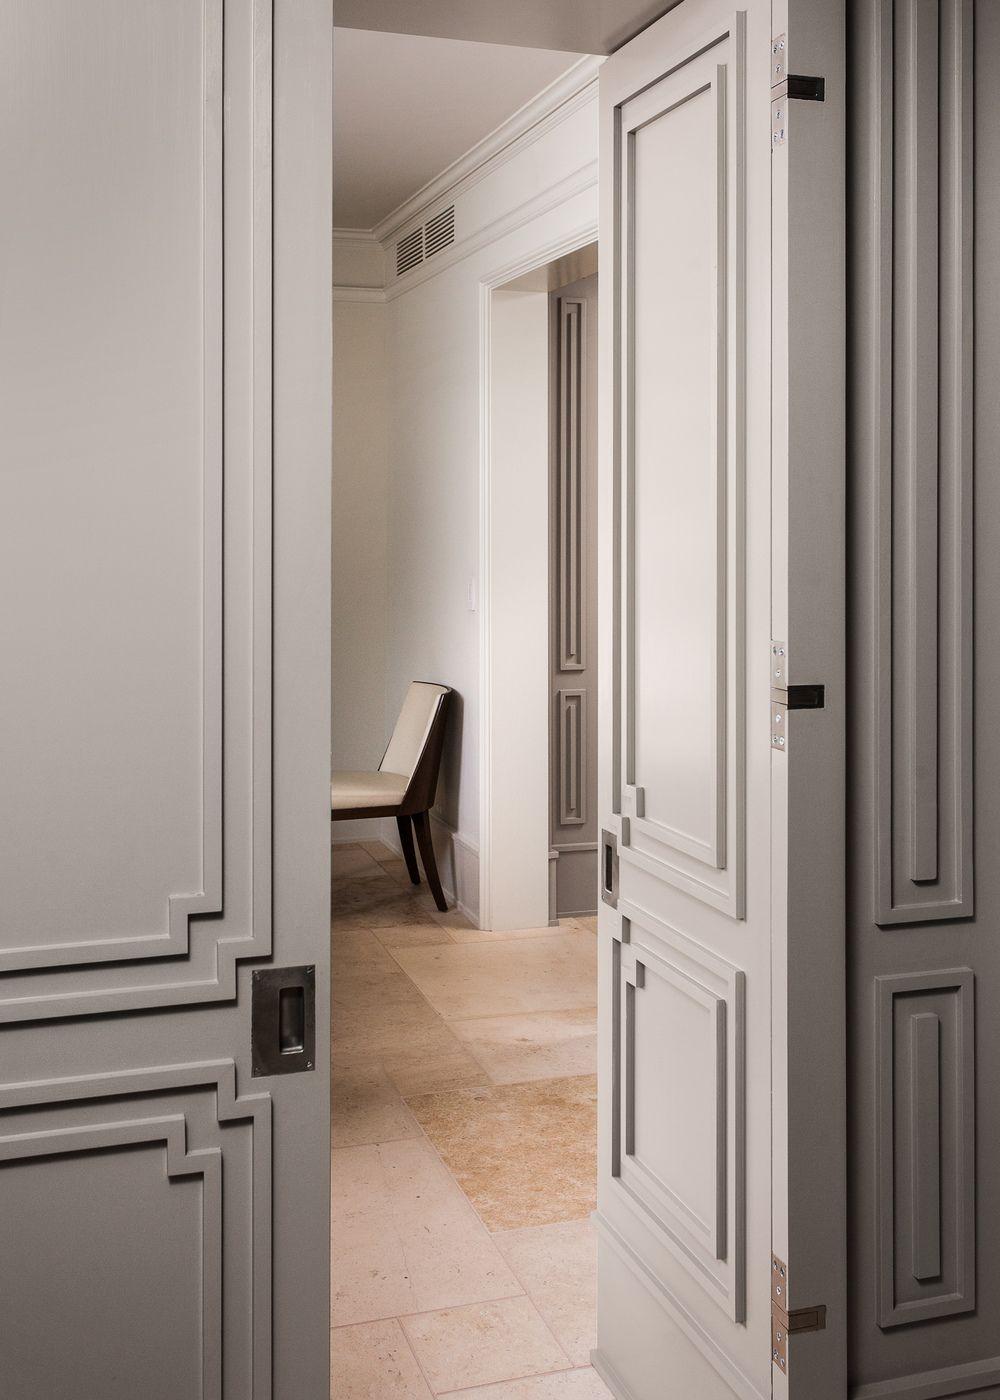 Tim barber interior doors pinterest doors interiors and moldings